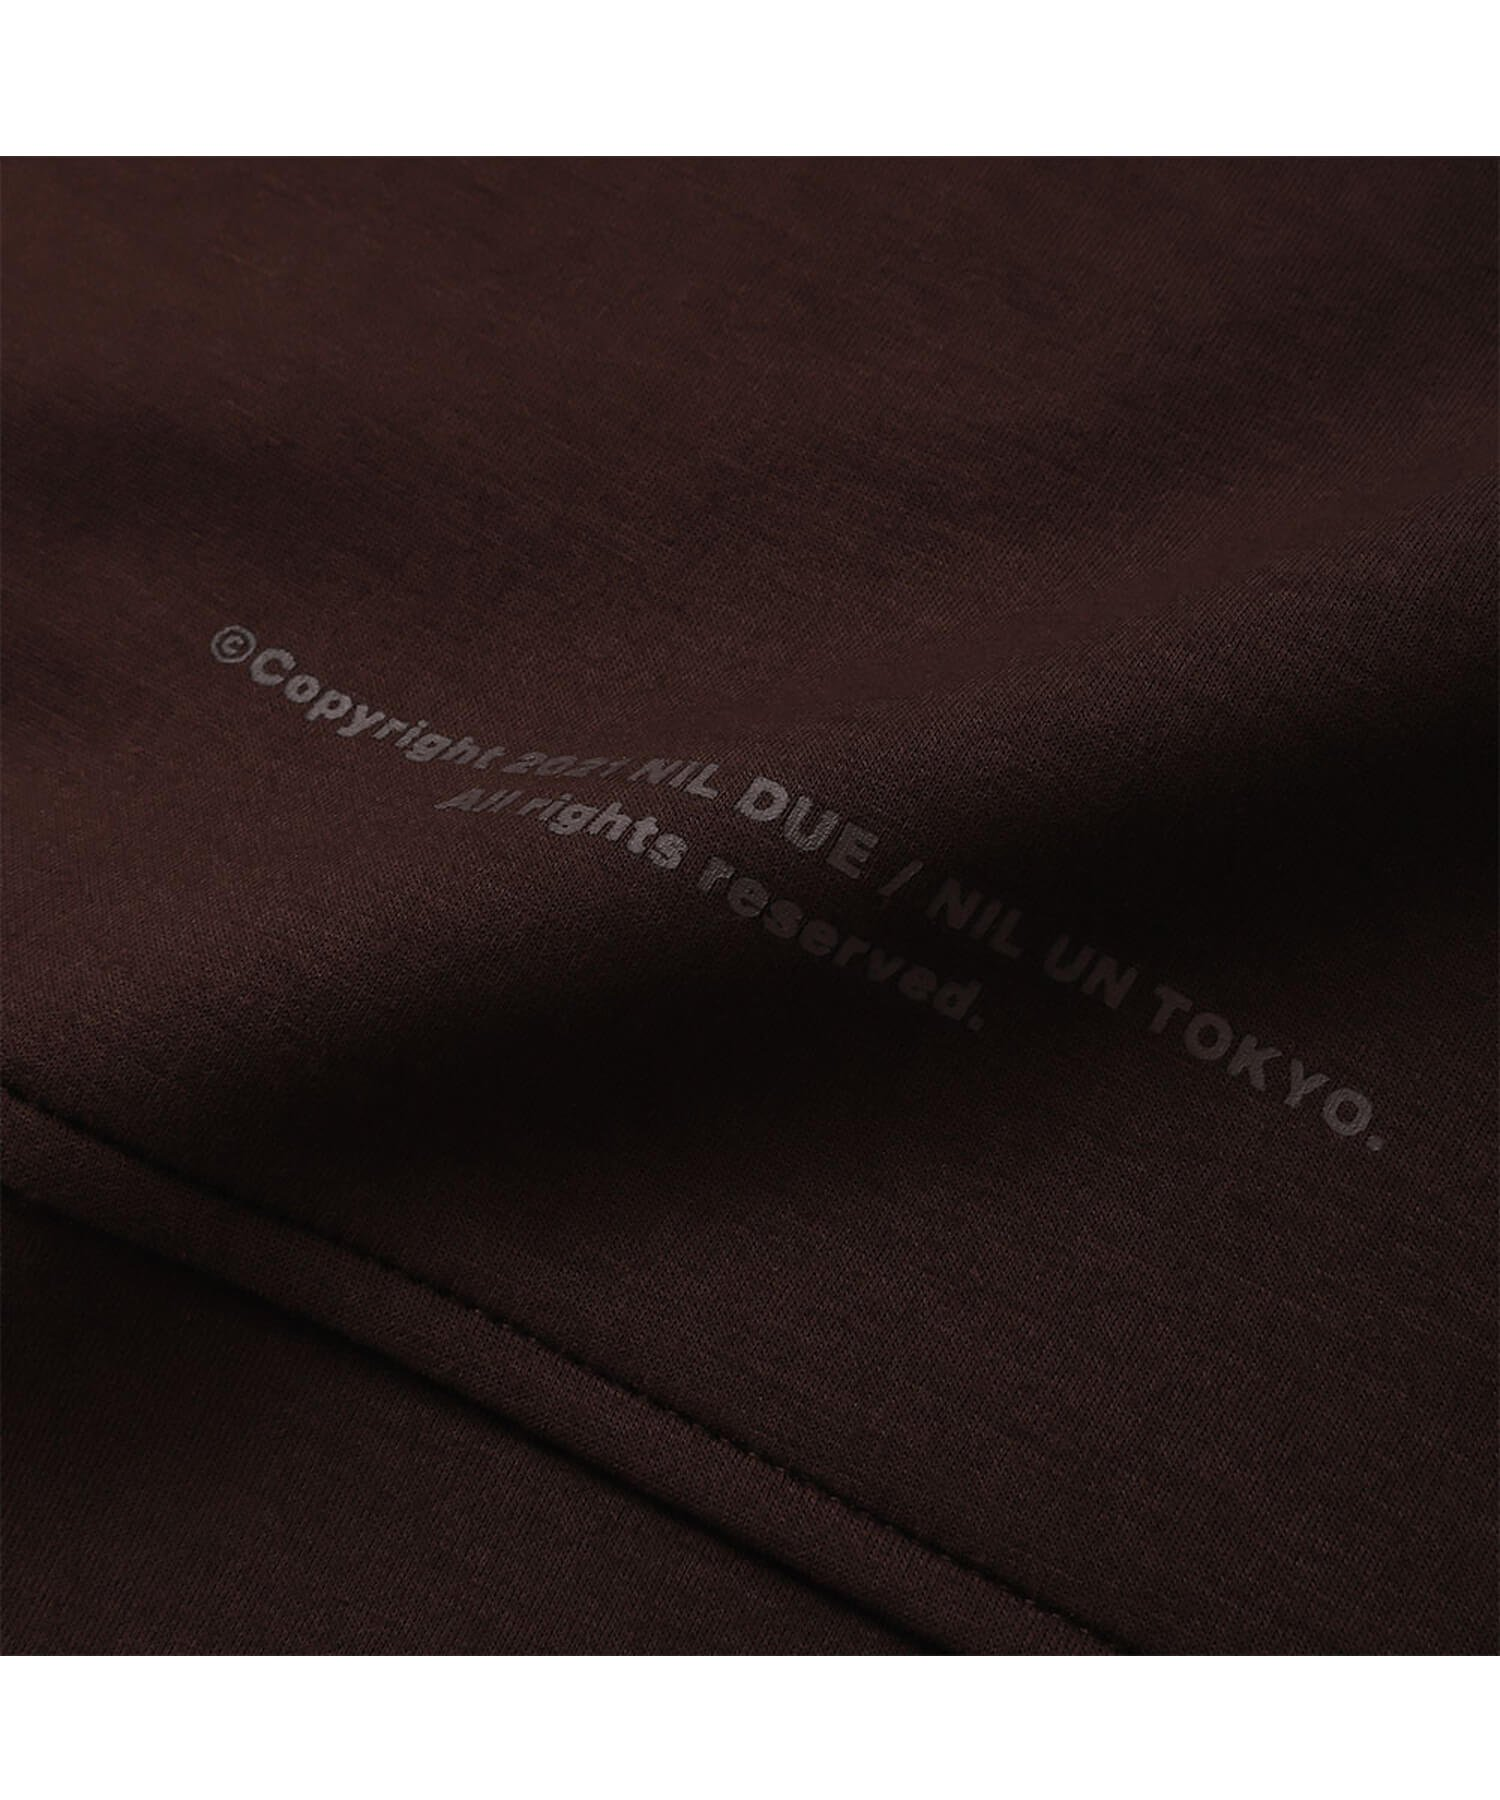 NIL DUE / NIL UN TOKYO / ニル デュエ / ニル アン トーキョー | EMBROIDERY LOGO HOODIE (CHOCOLATE BROWN) 商品画像3